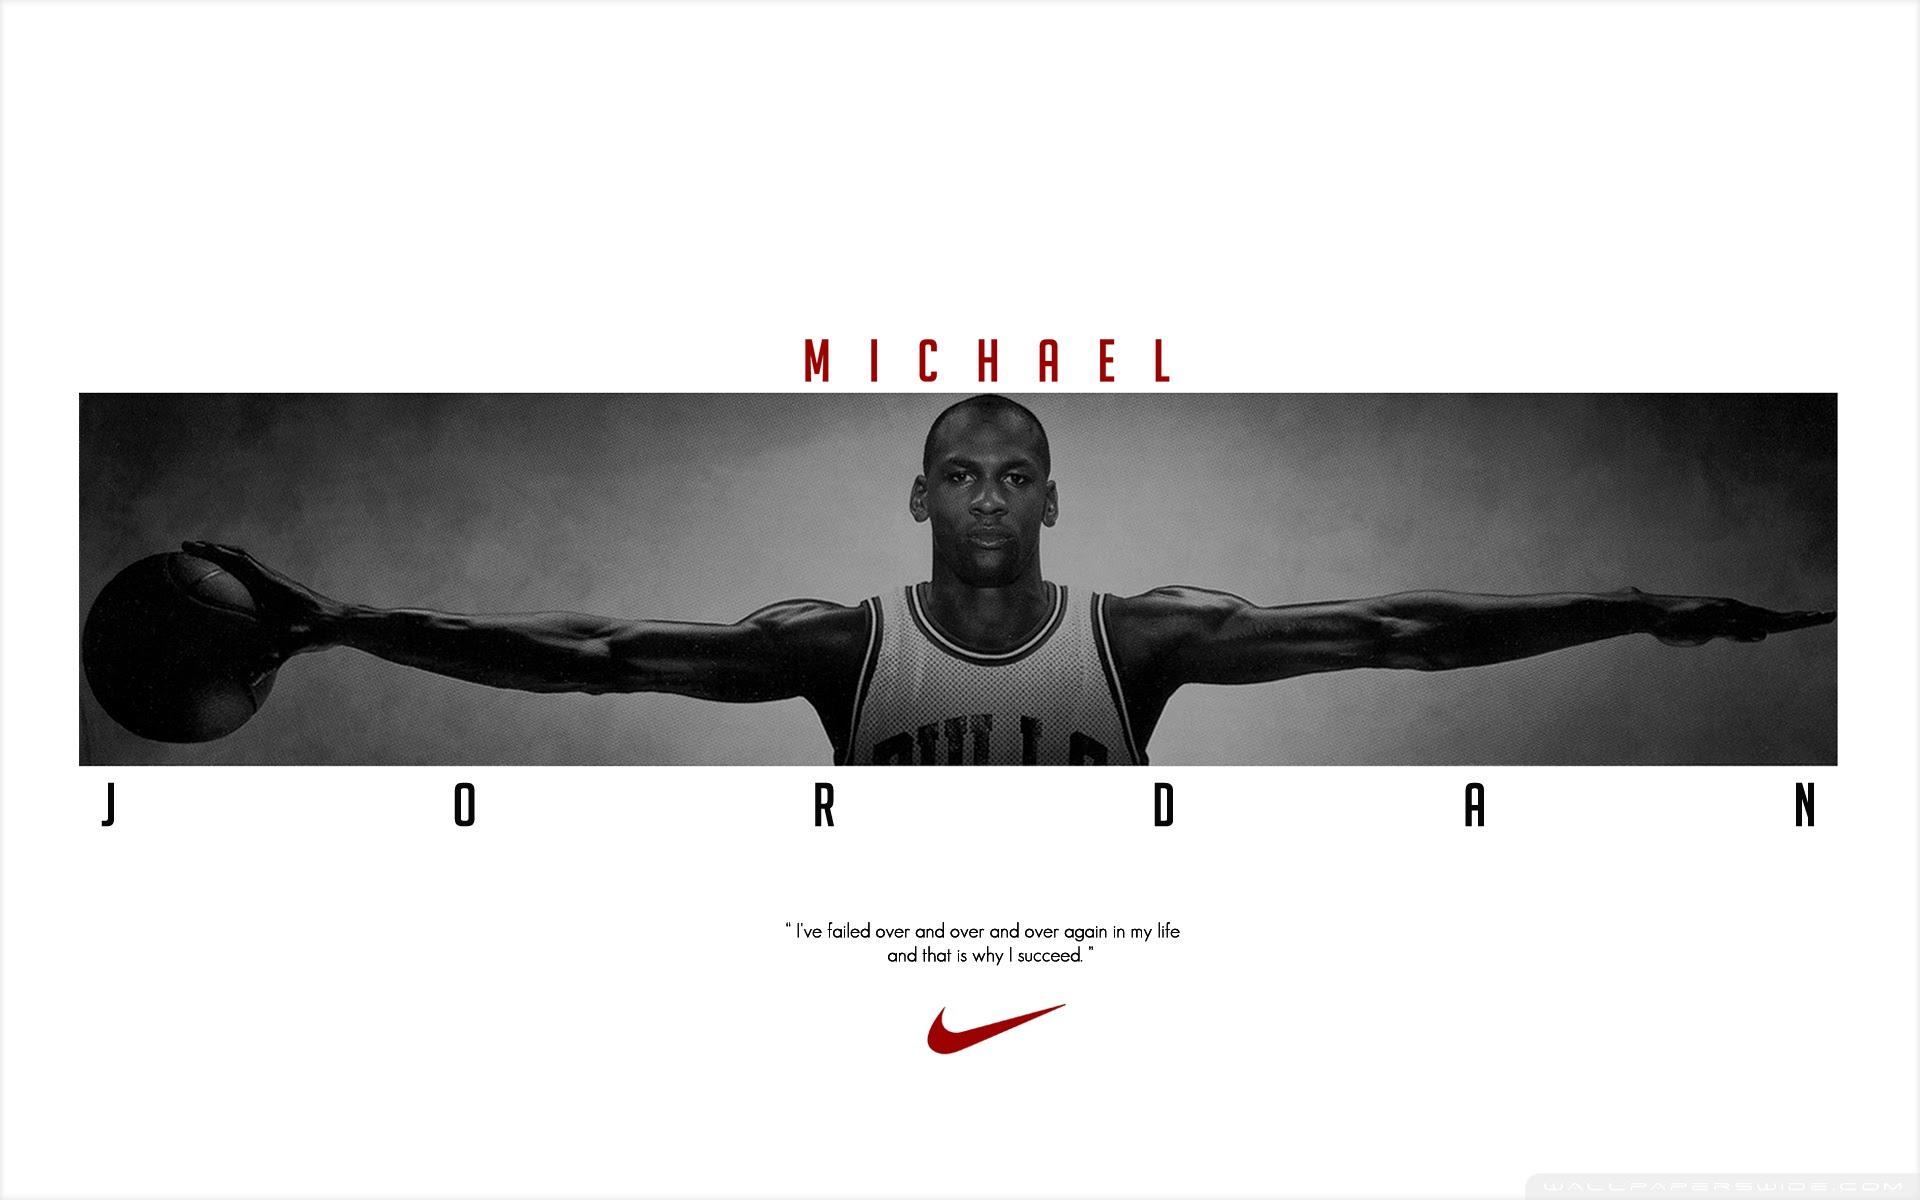 Michael Jordan Ultra Hd Desktop Background Wallpaper For 4k Uhd Tv Tablet Smartphone